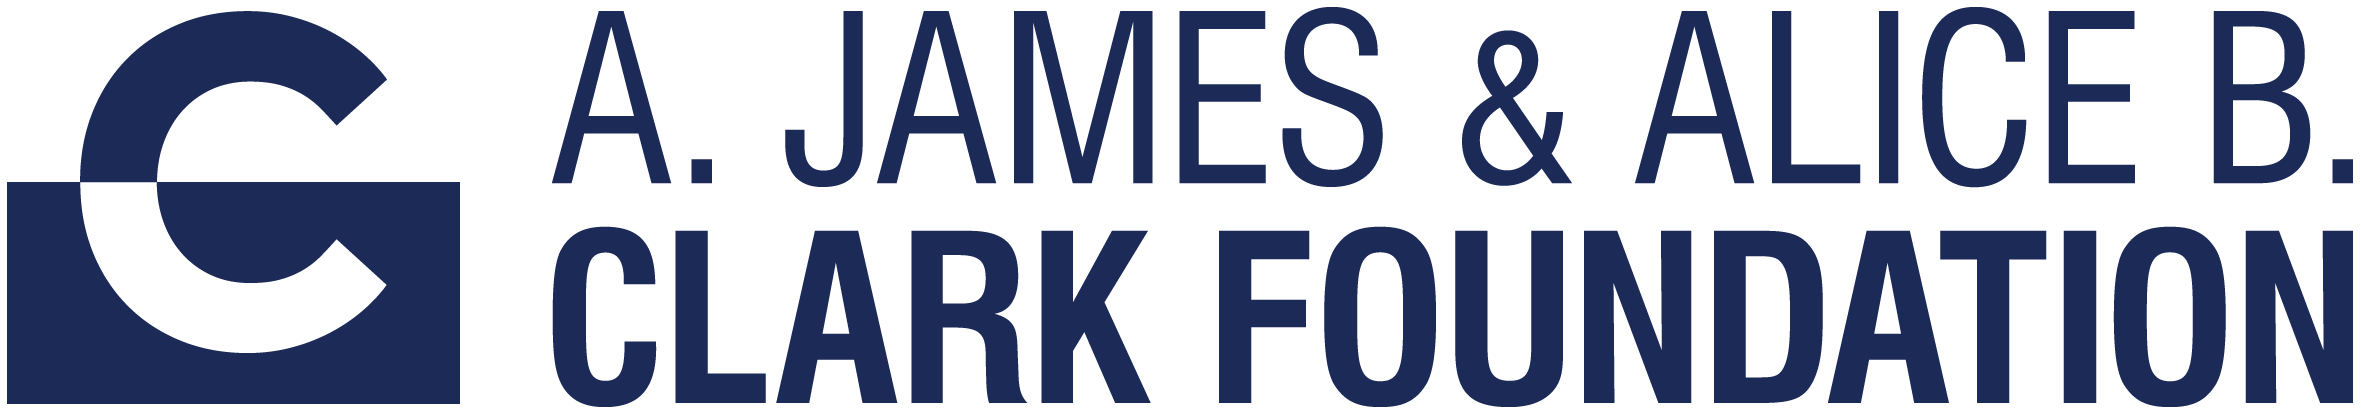 A. James & Alice B. Clark Foundation